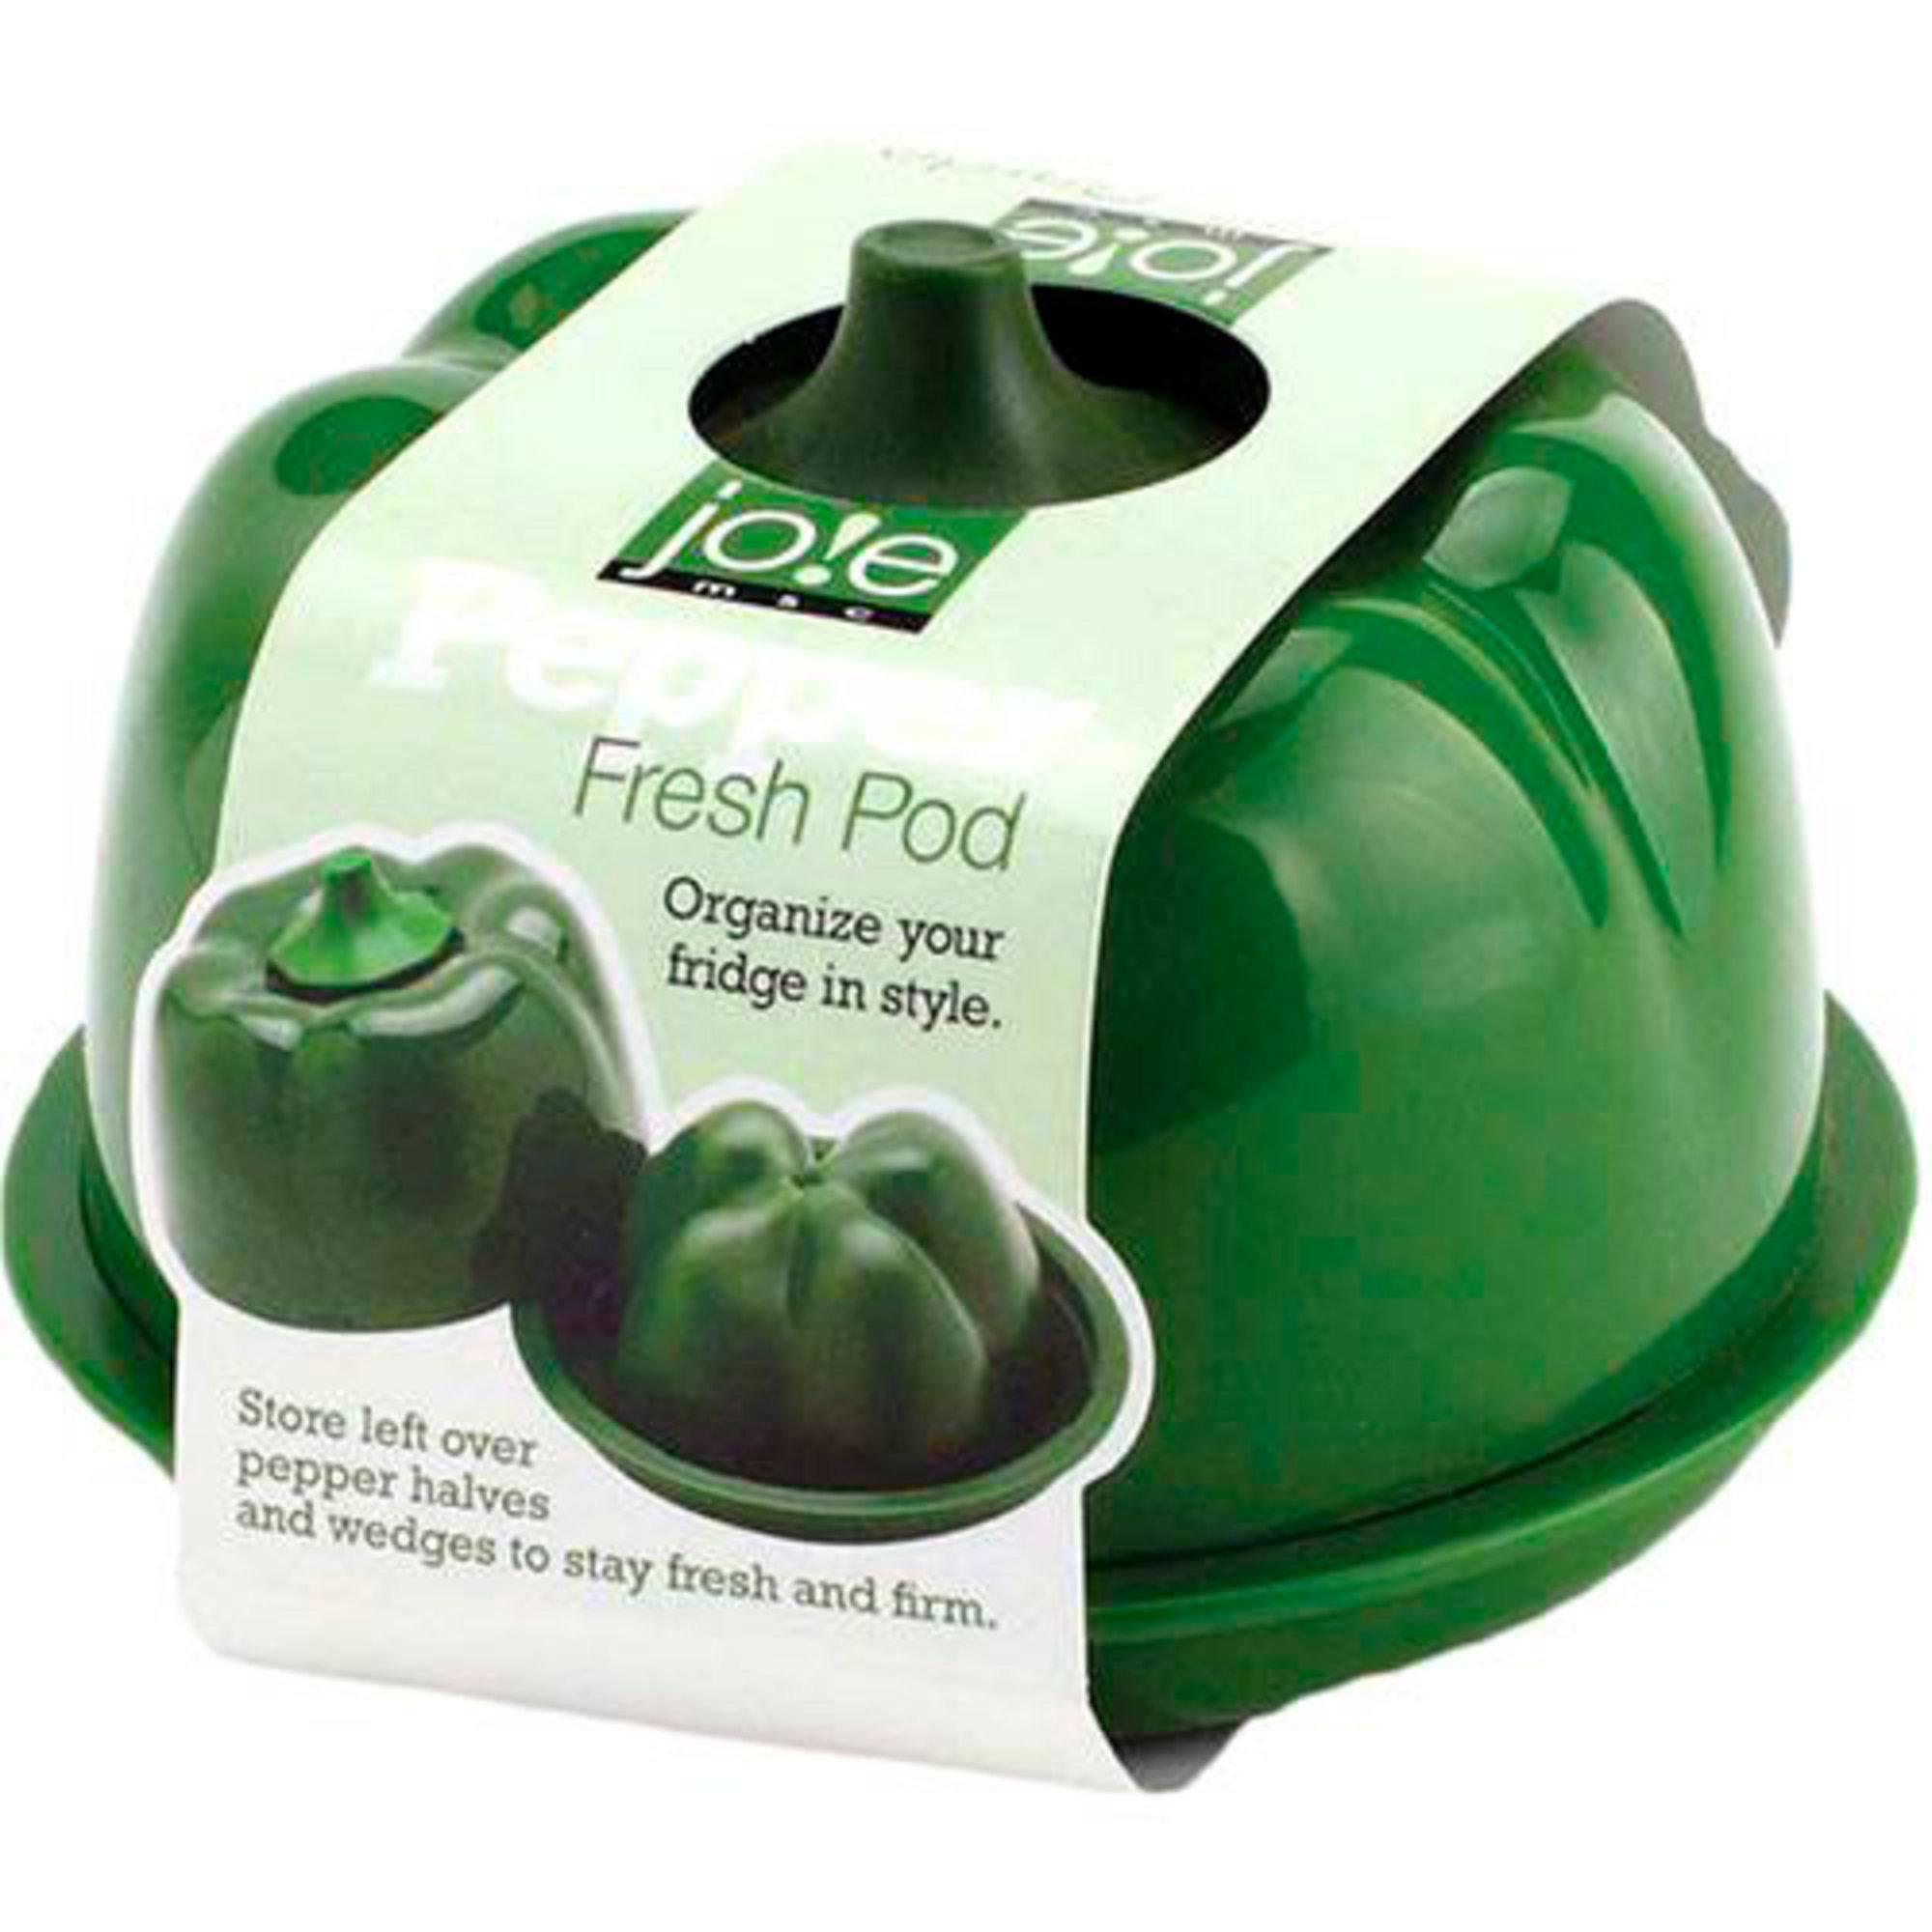 Joie Paprikaförvaring Pepper Pod